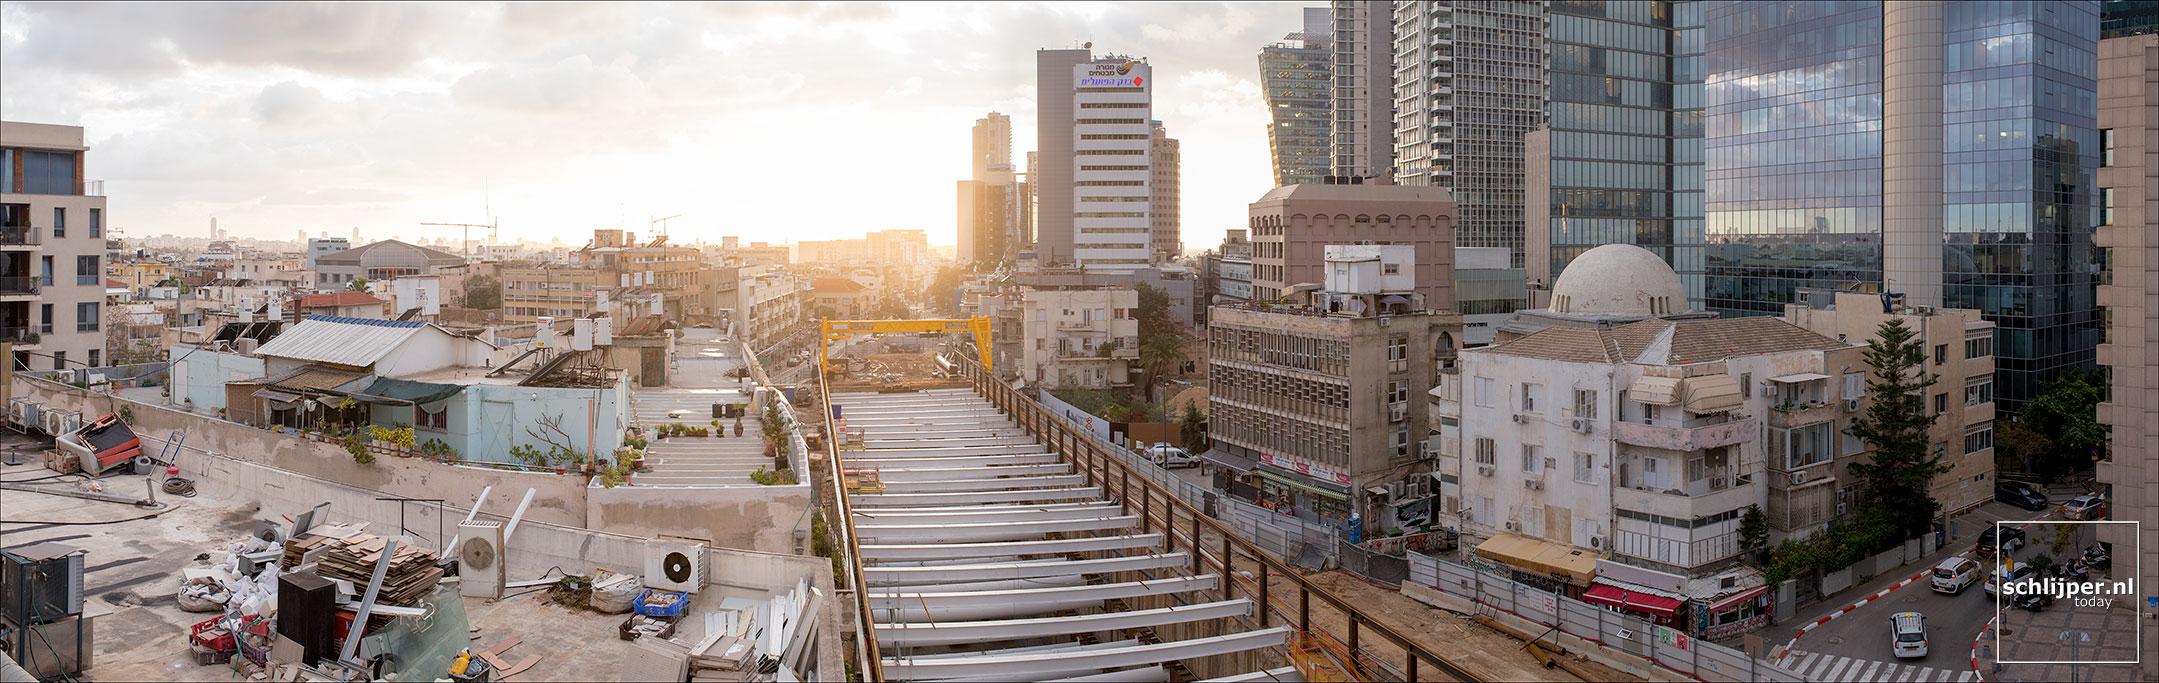 Israel, Tel Aviv, 2 januari 2018